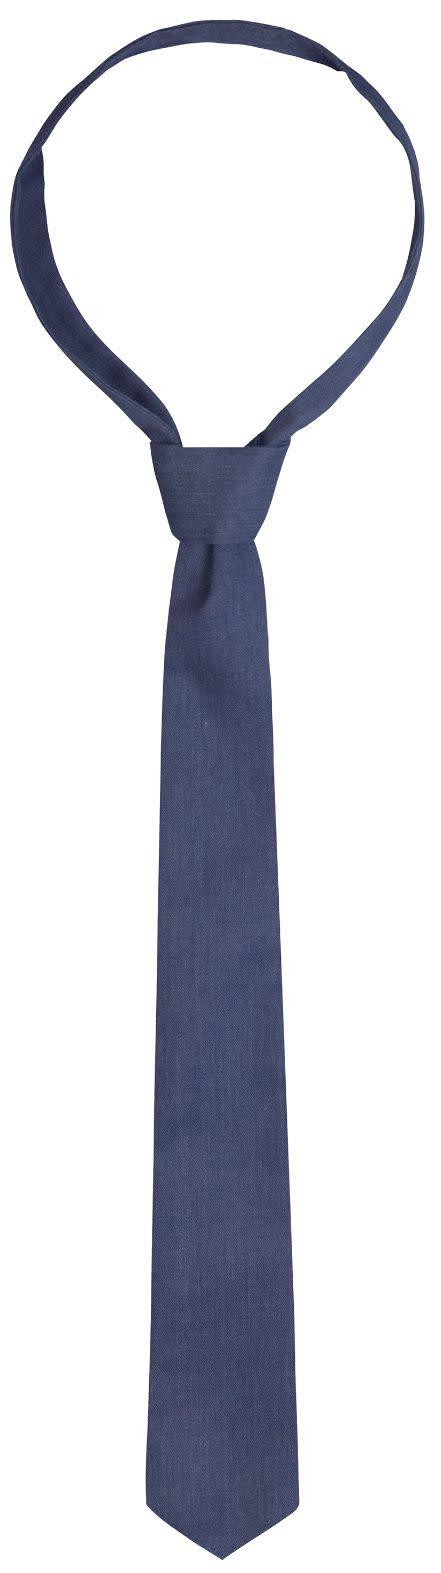 BLUE:Vintage Blue (ca. Pantone 2108C)